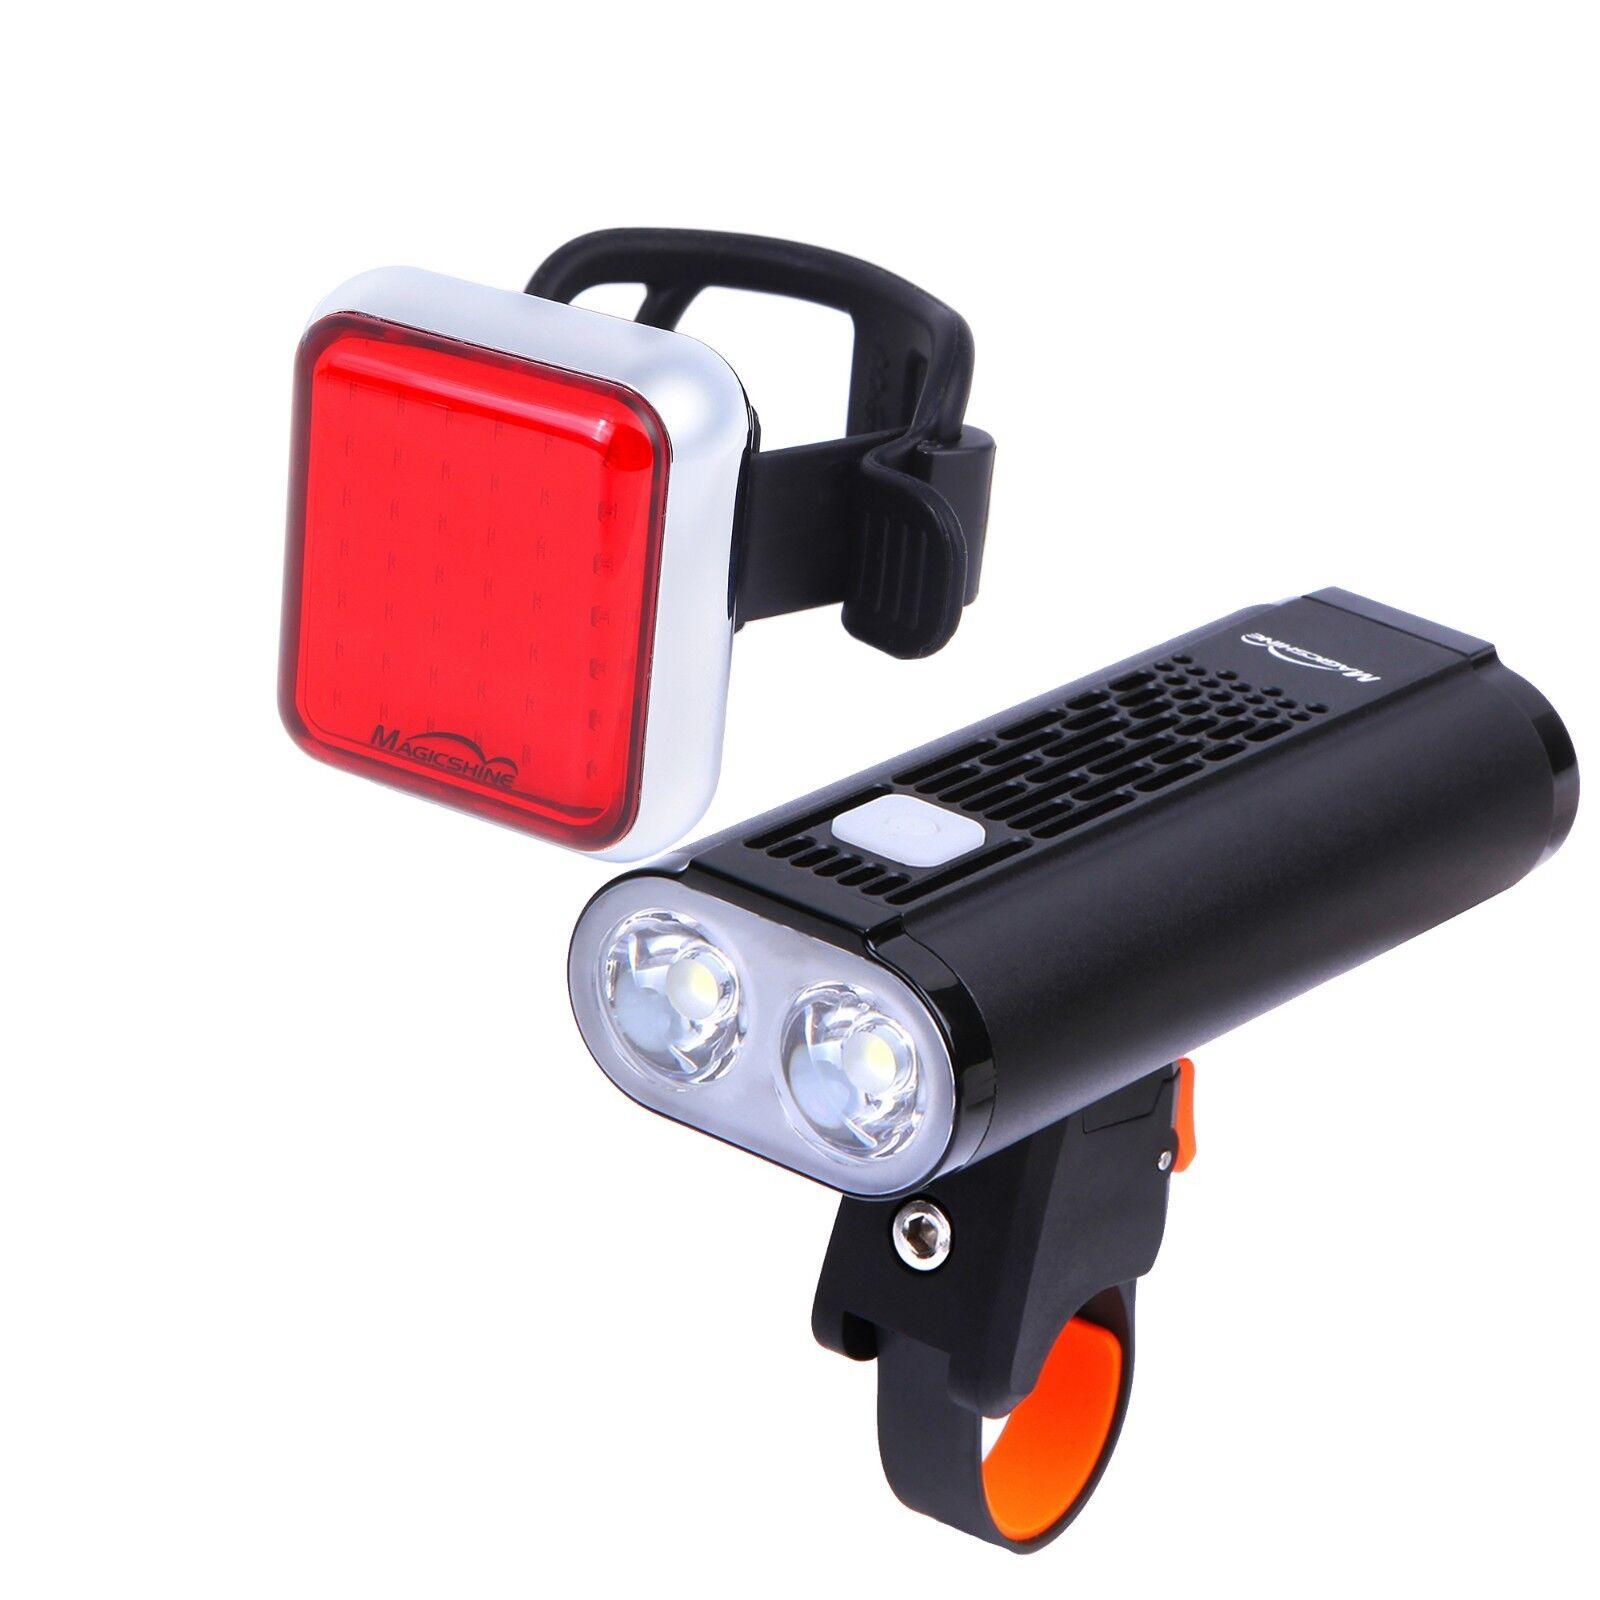 Magicshine Monteer 1400 Bicycle Headlight + Seemee 60 Bike Taillight Blinker